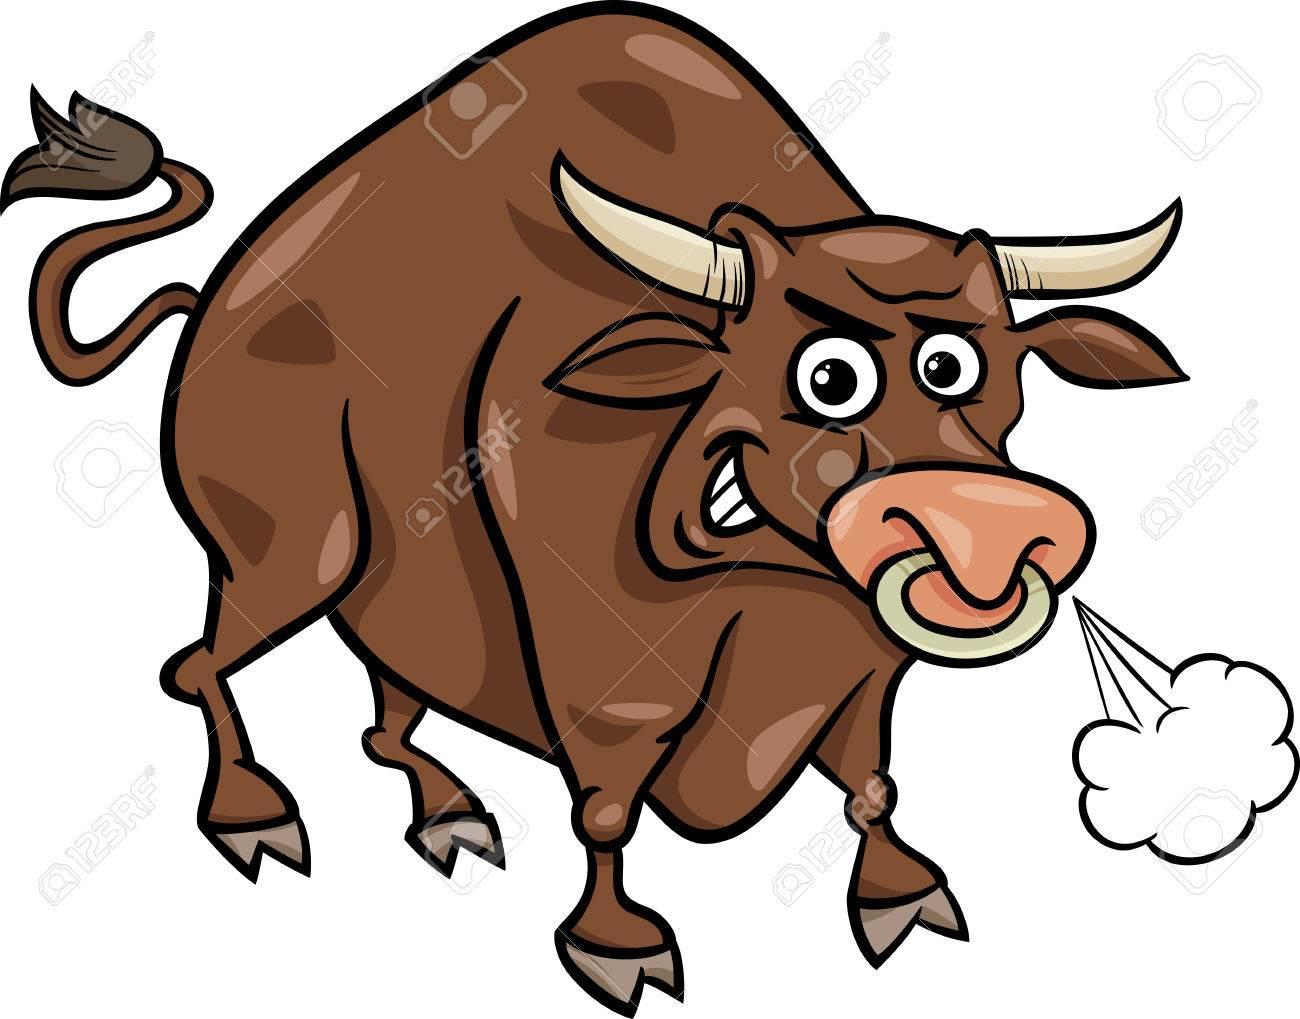 Cartoon Illustration Of Funny Farm Bull Animal Royalty Free ...